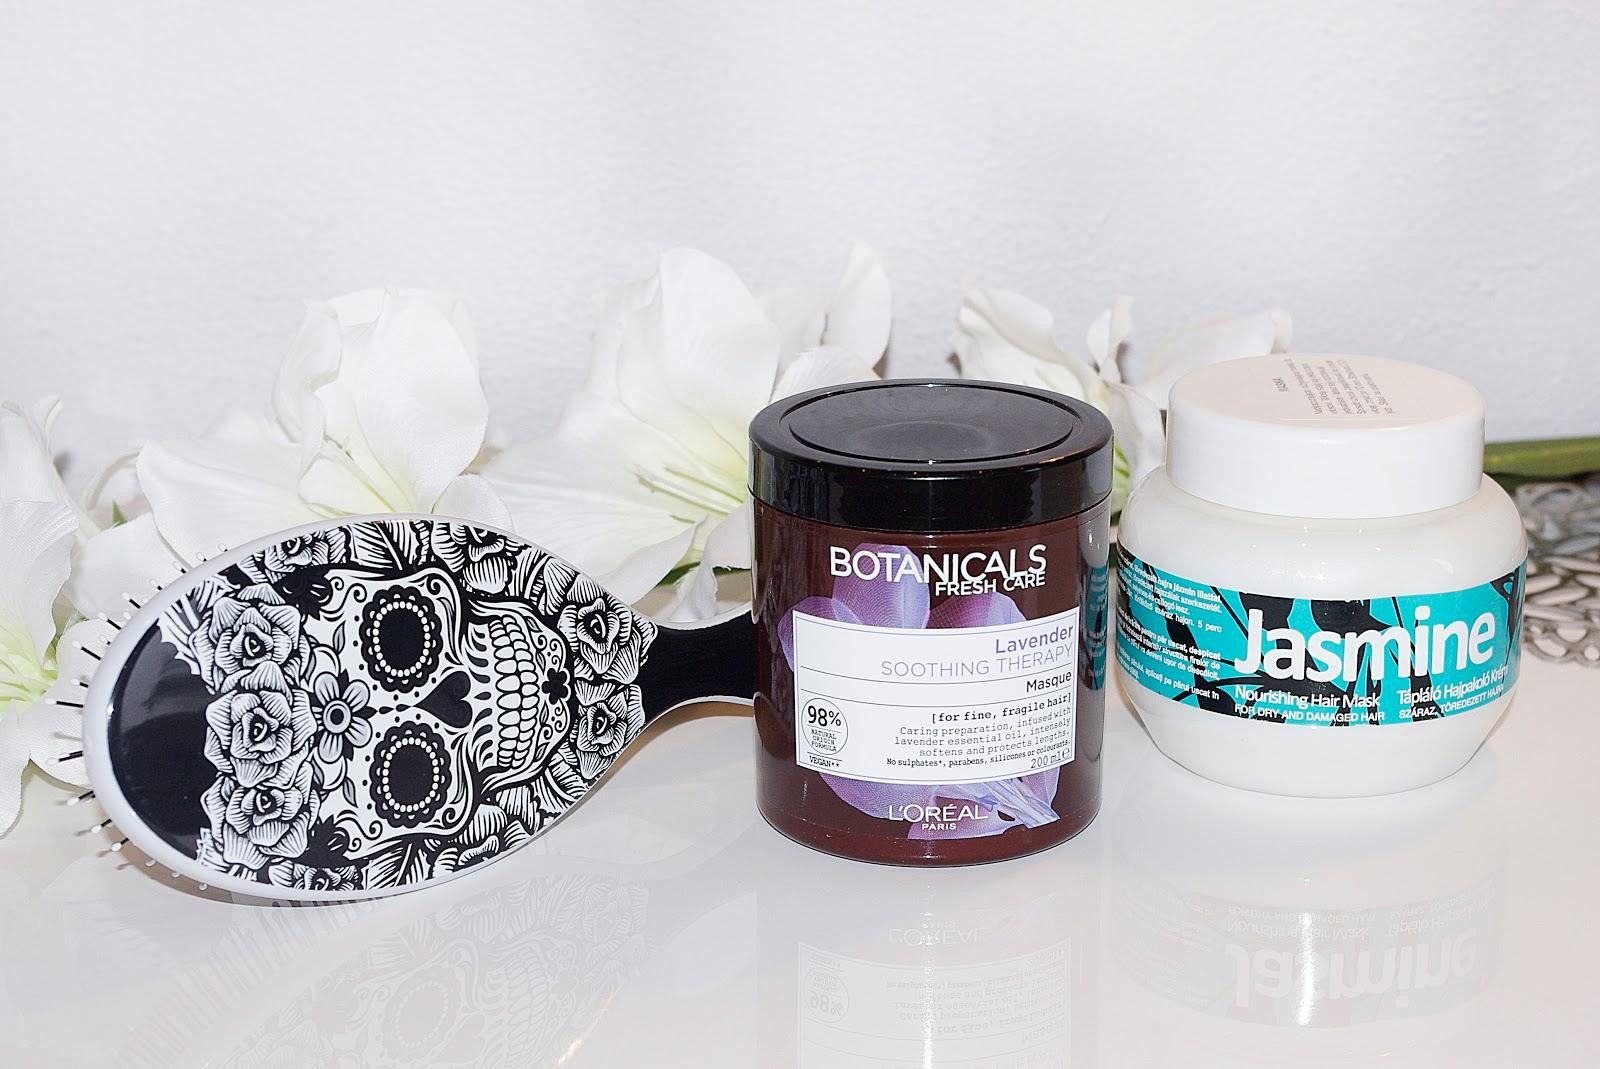 nowości the wet brush loreal maska do włosów botanicals lavender kallos jasmine